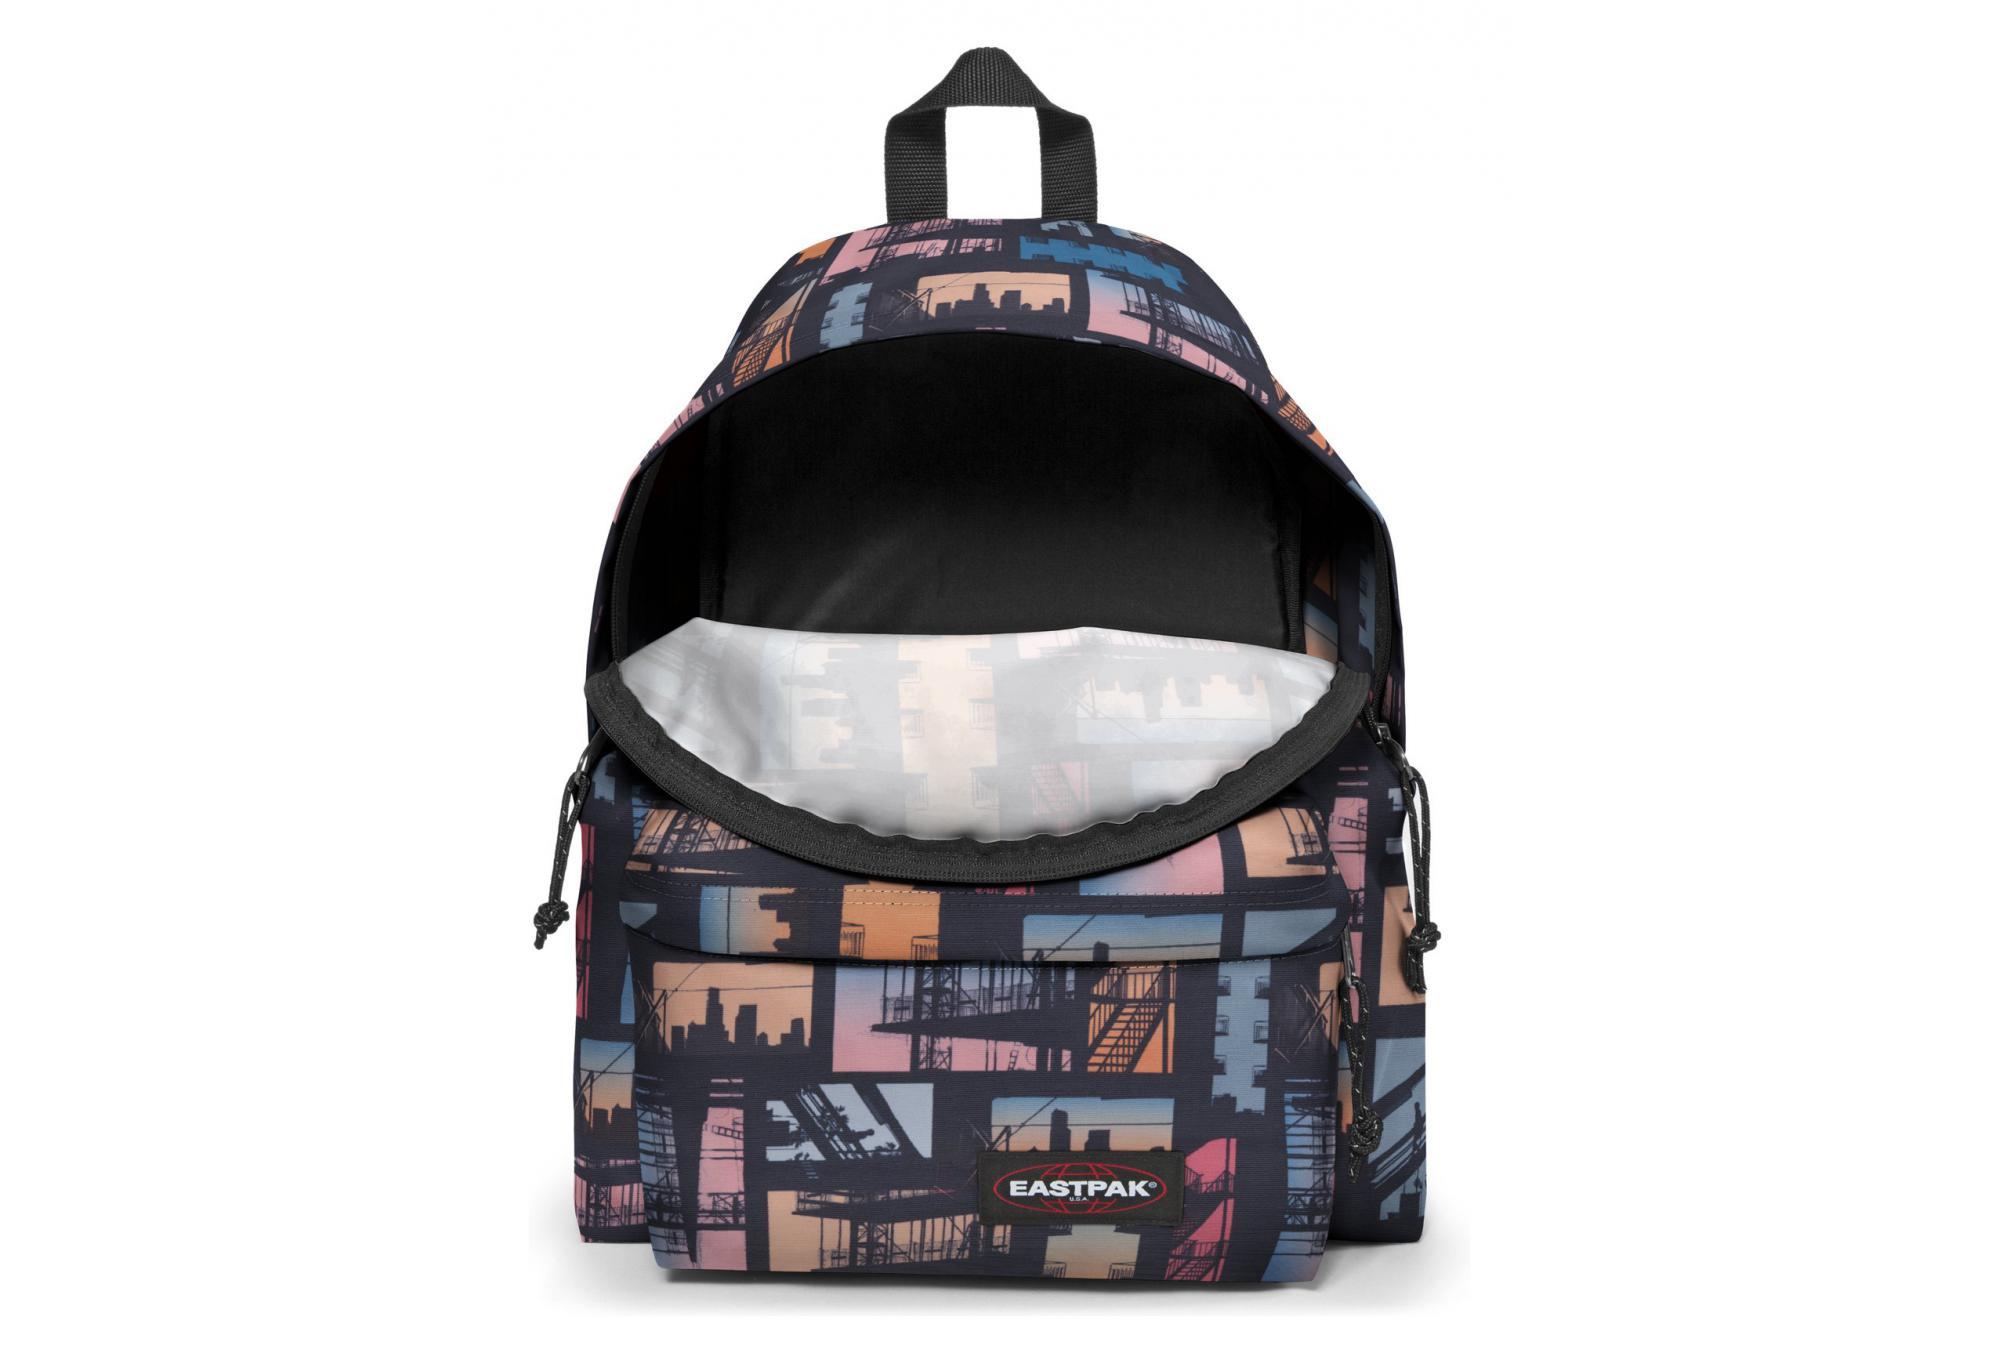 releasedatum: 100% hoge kwaliteit goede pasvorm Eastpak Padded Pak'R Backpack Sundowntown